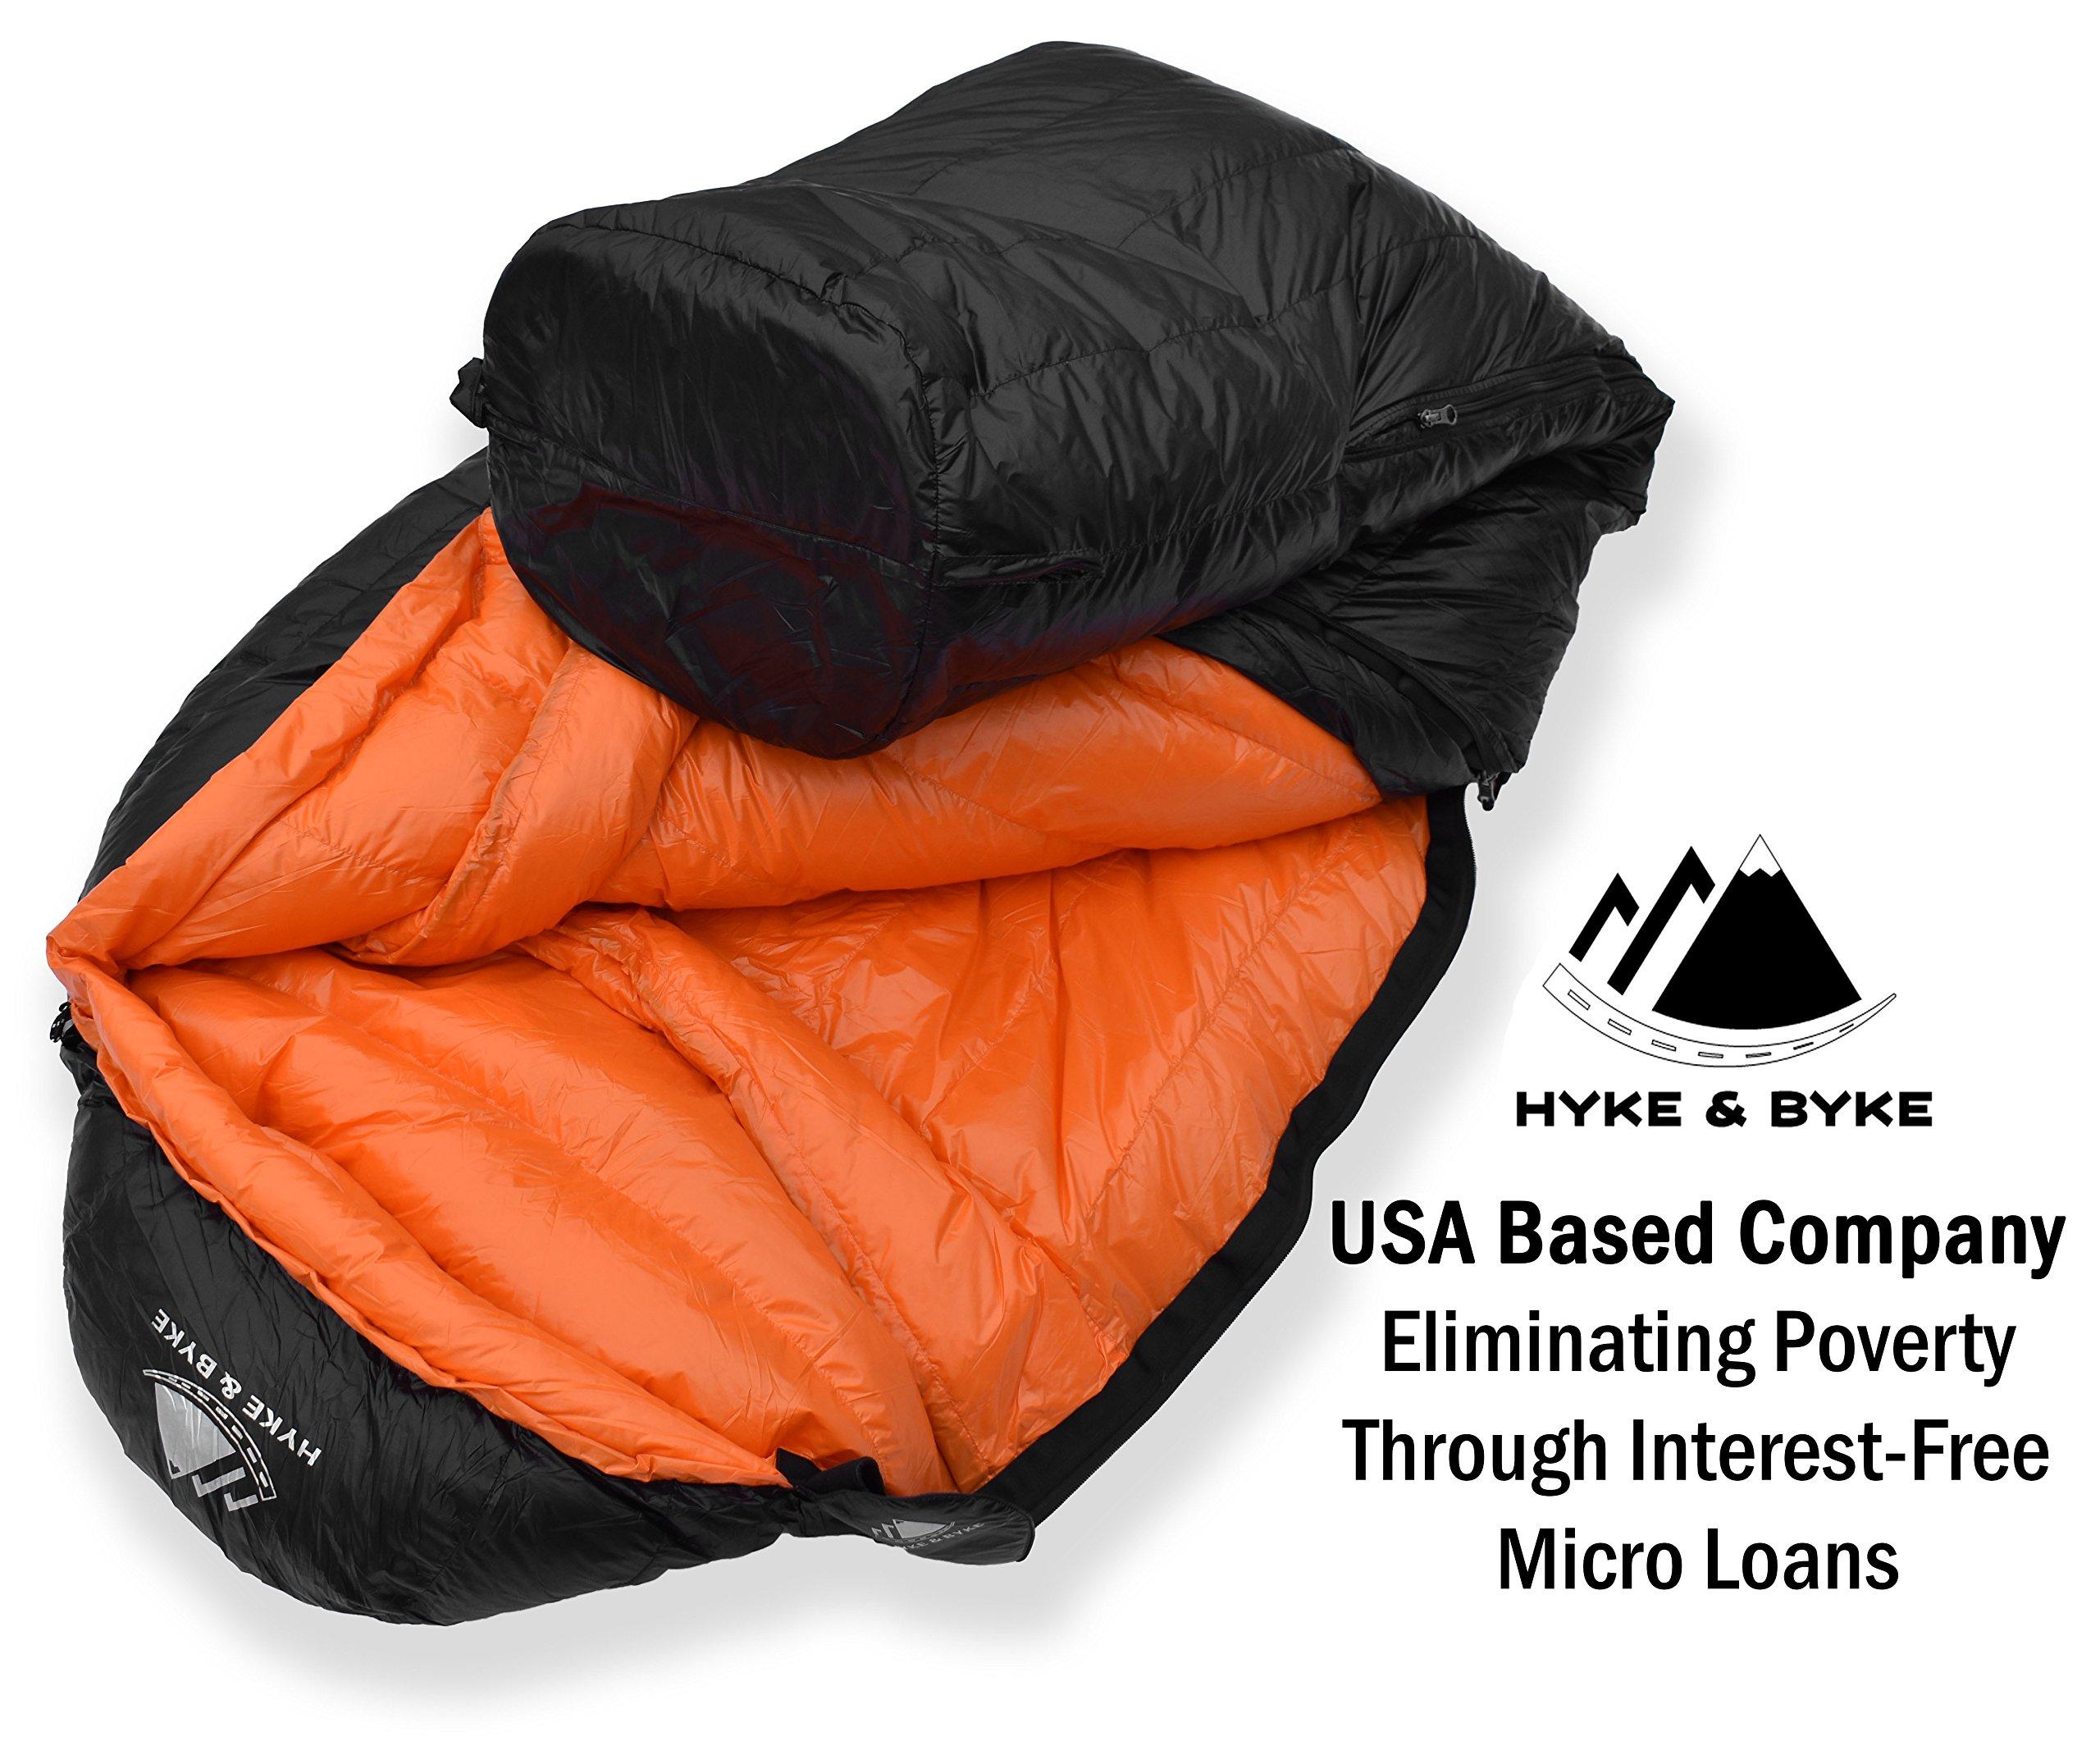 Hyke & Byke Eolus 15 & 30 Degree F 800 Fill Power Hydrophobic Goose Down Sleeping Bag with ClusterLoft Base - Ultra Lightweight 3 Season Men's and Women's Mummy Bag Designed for Backpacking 8